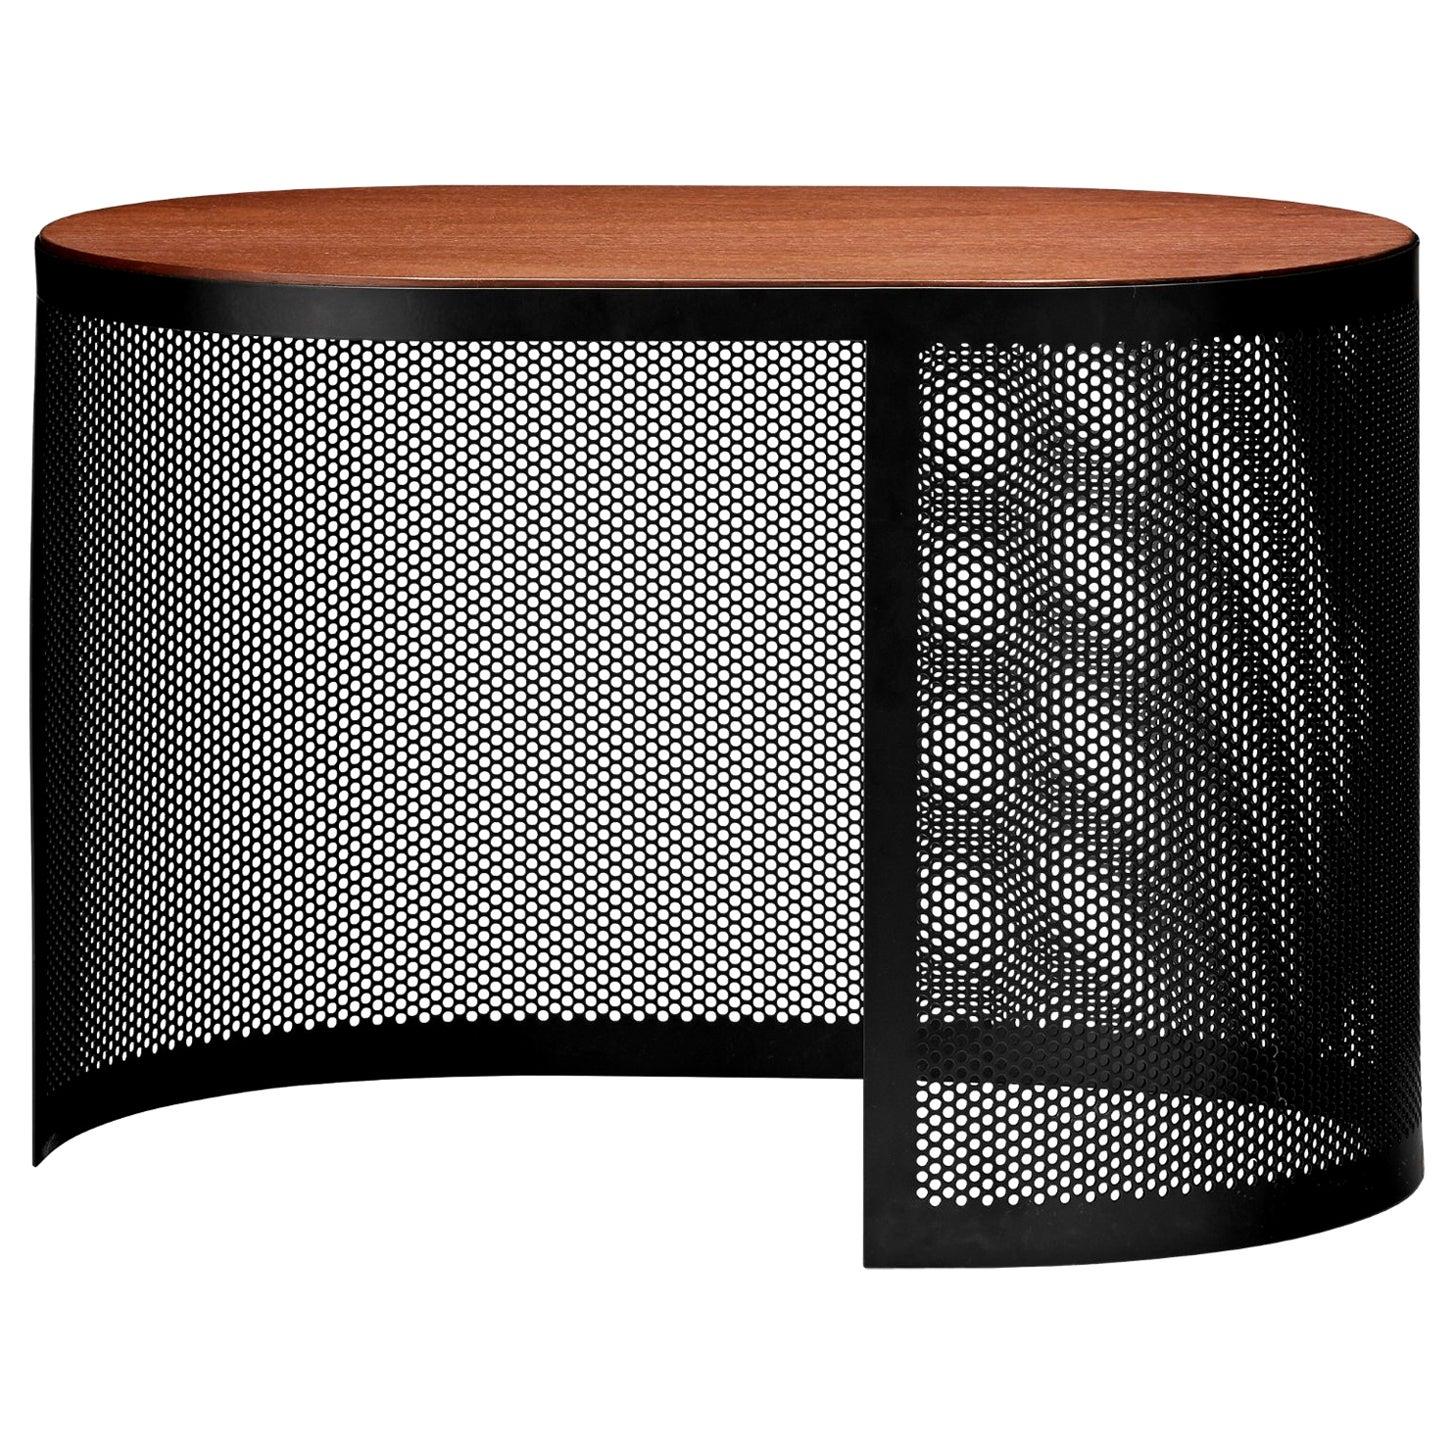 Walnut and Steel Contemporary Medium Side Table